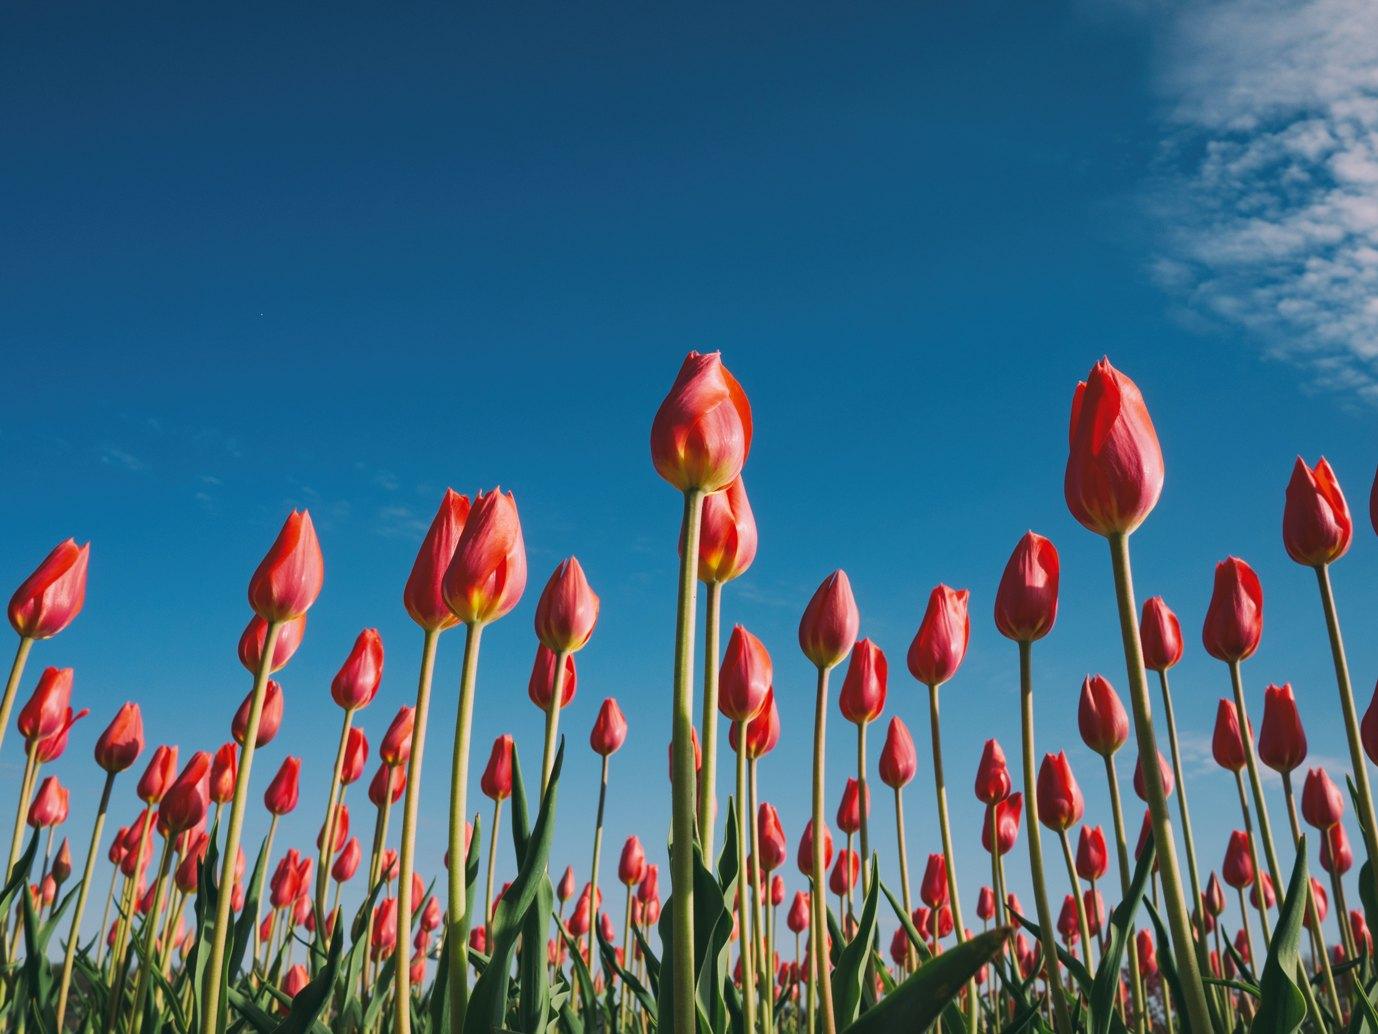 La tulipomania o crisis de los tulipanes